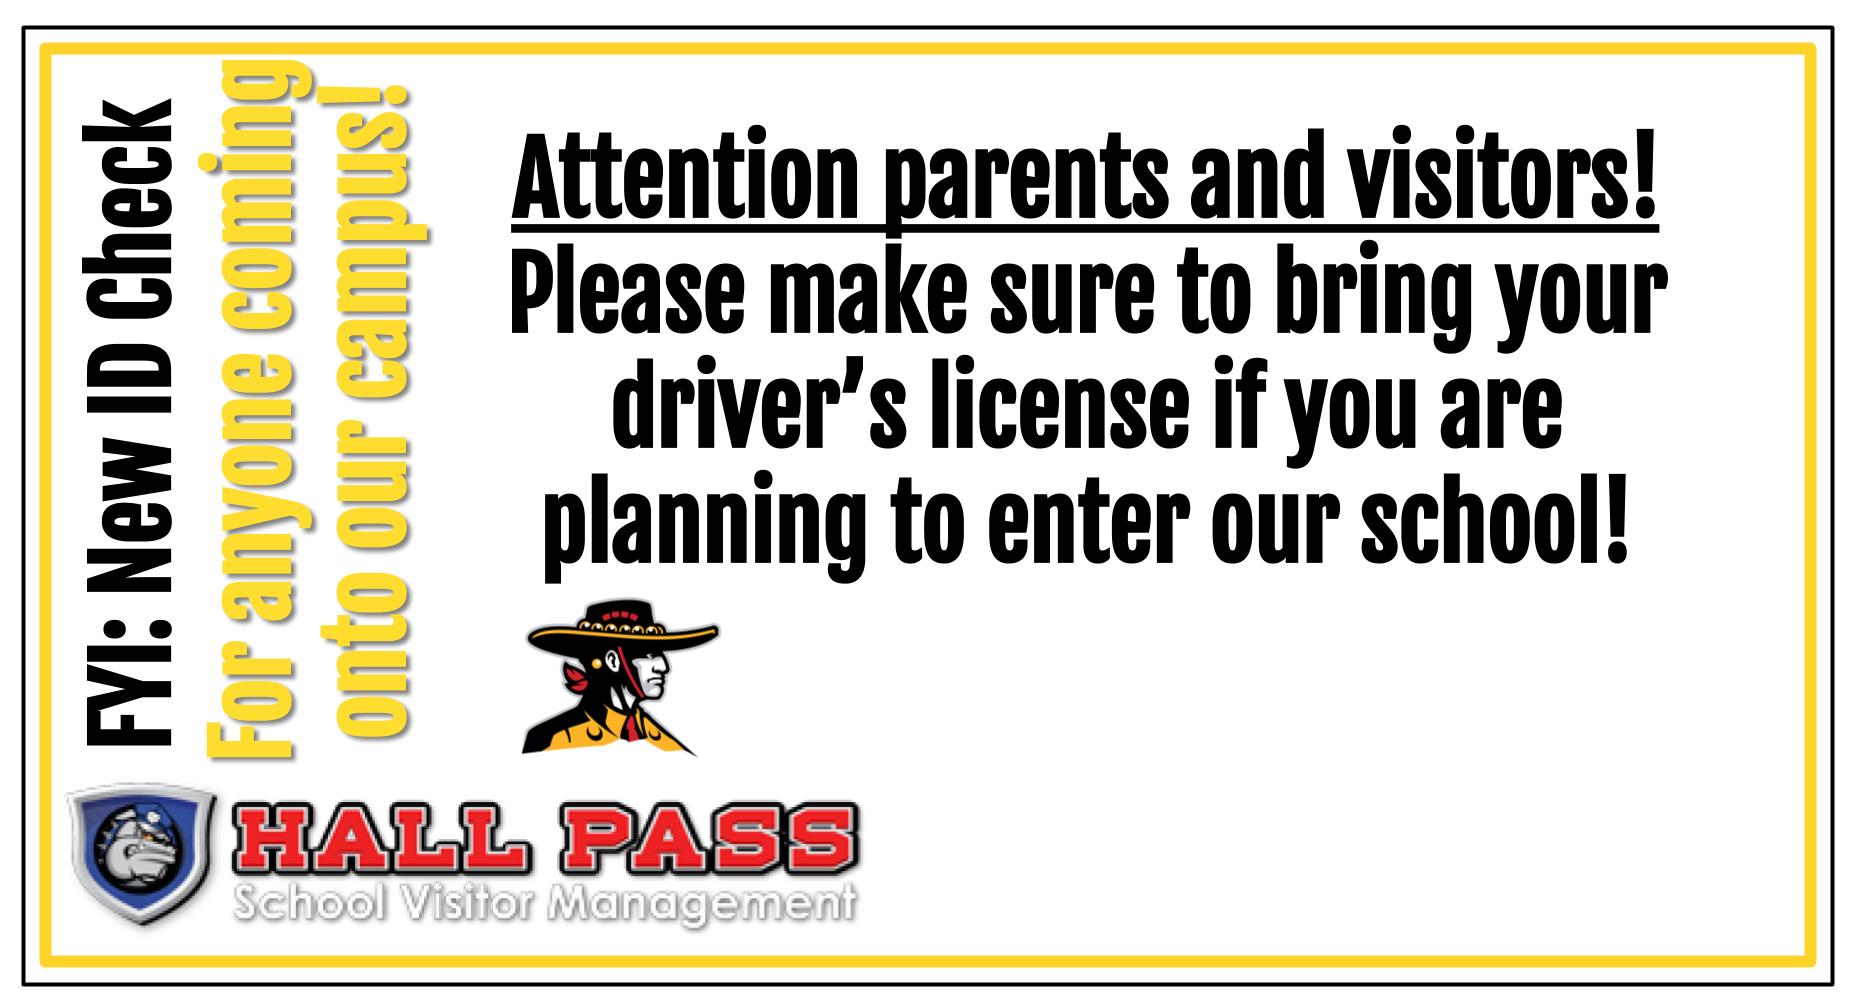 Hall Pass Info